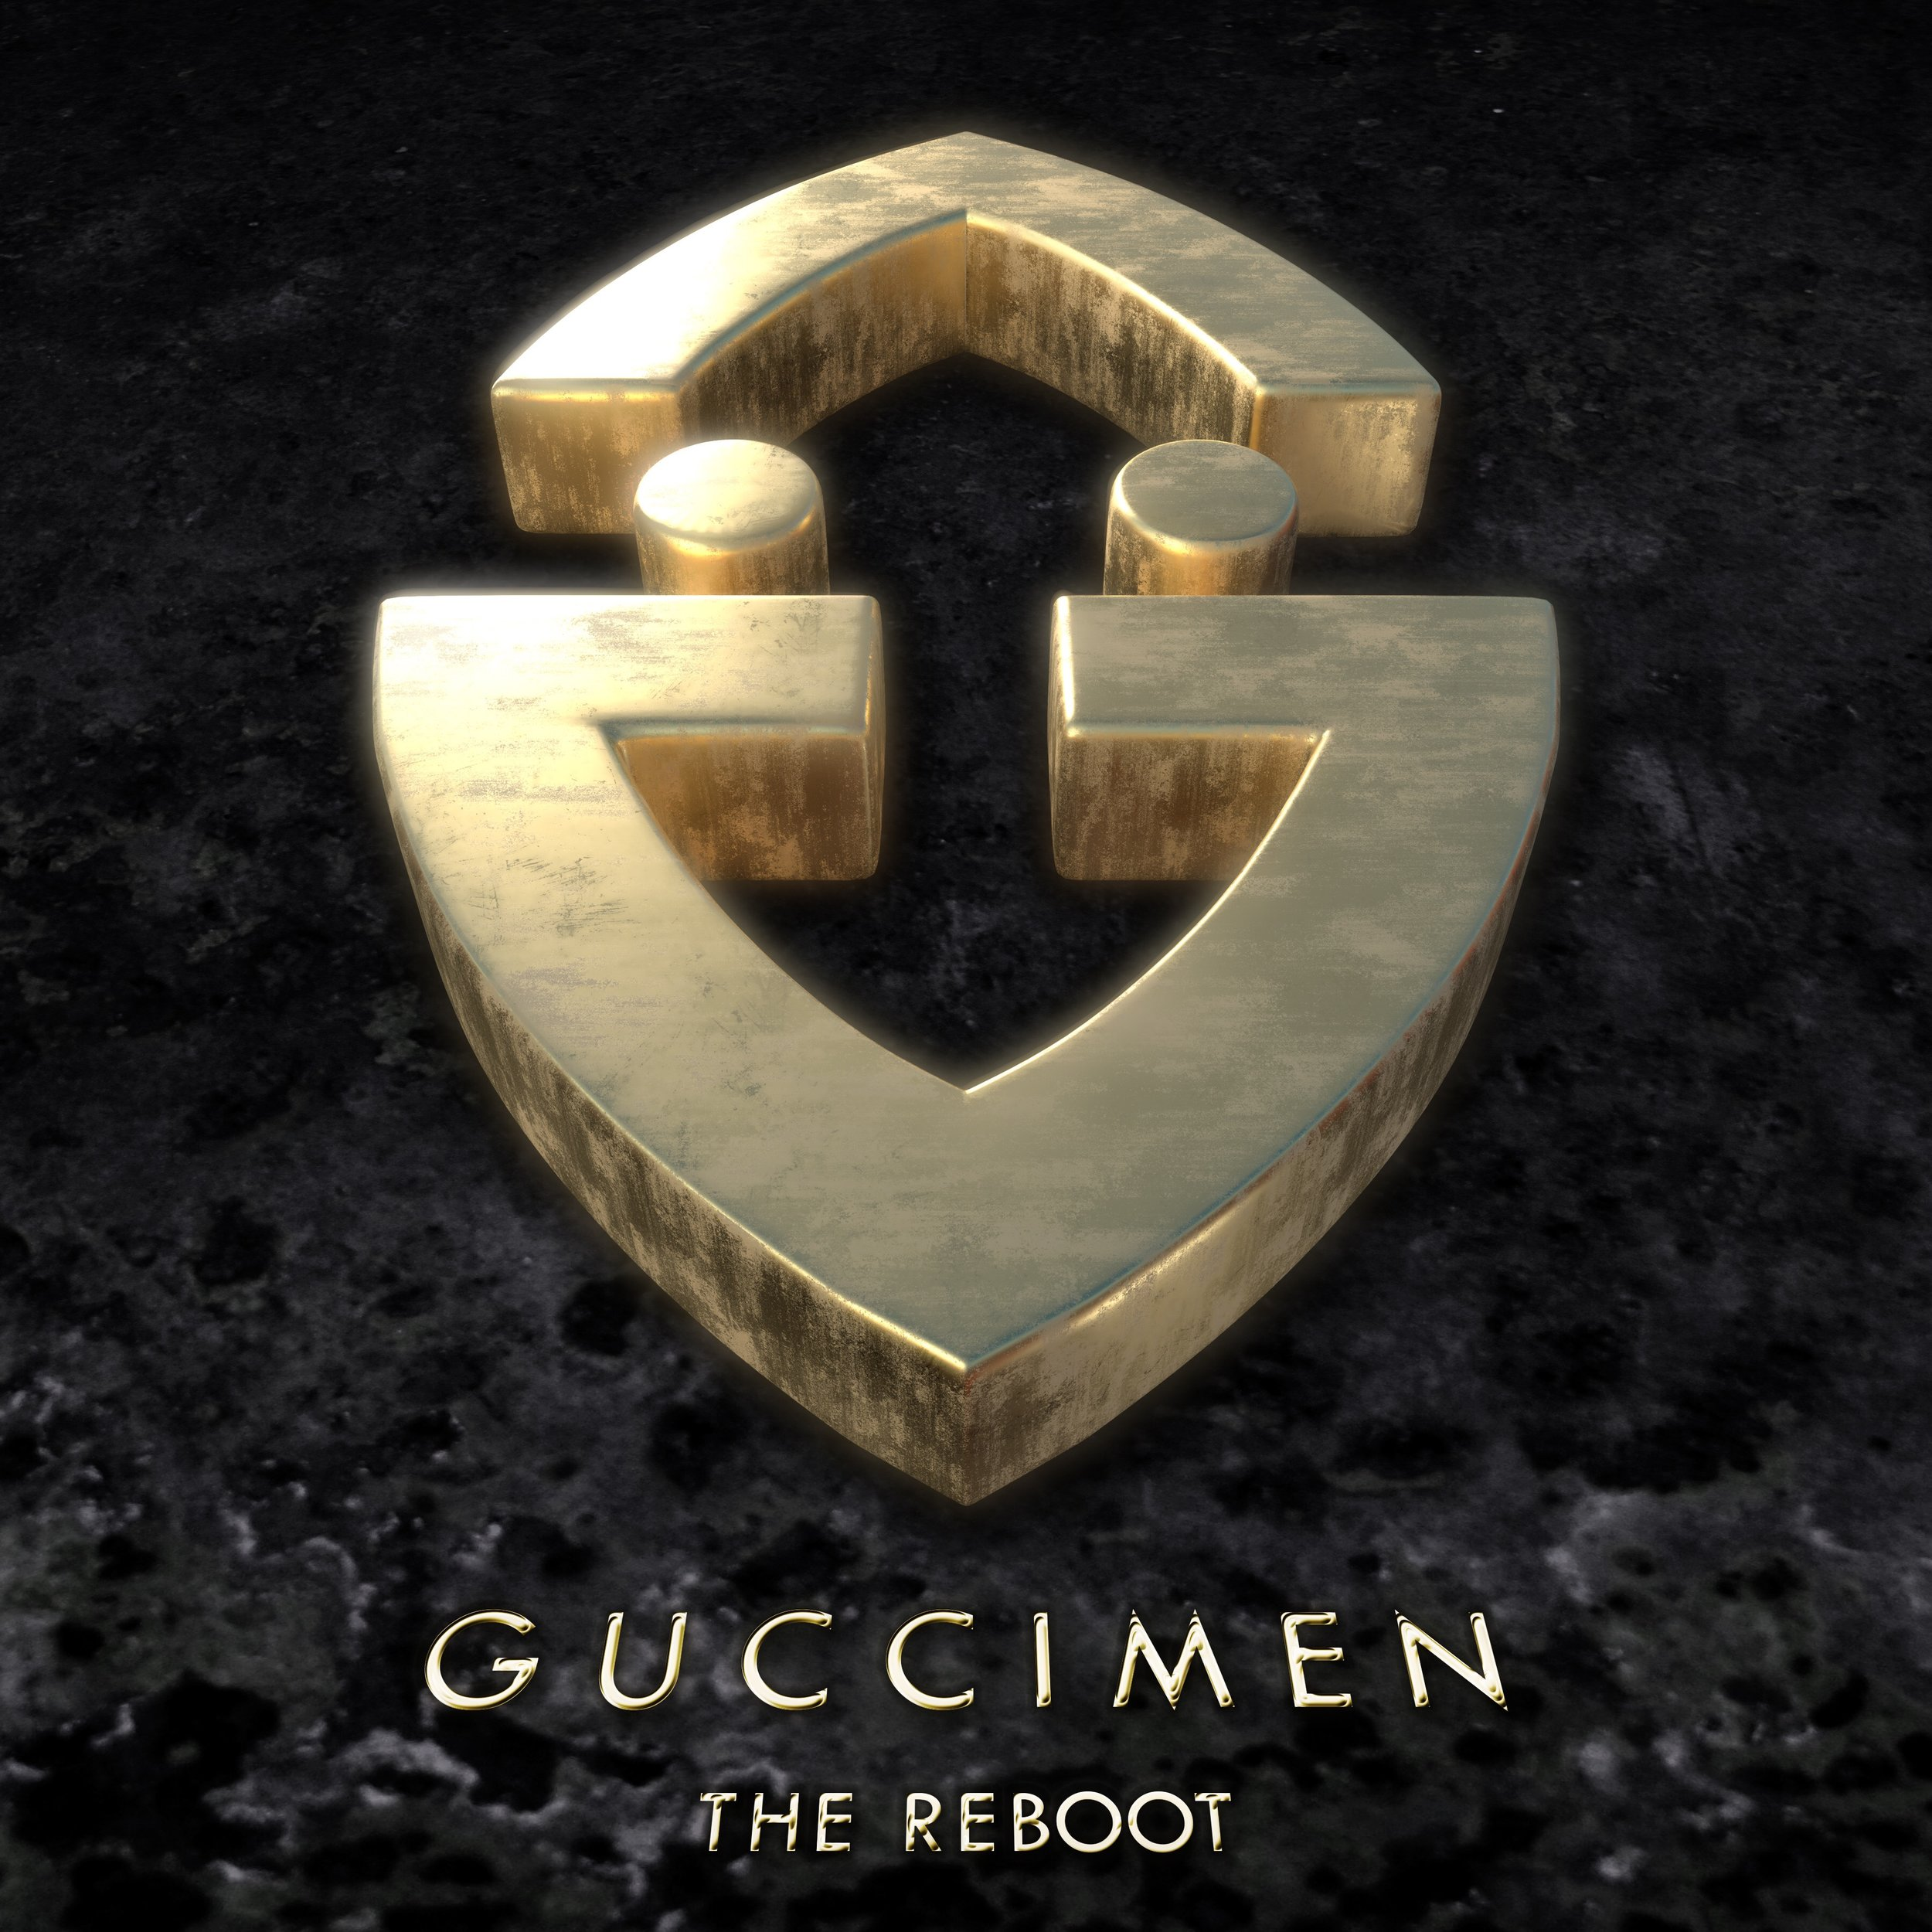 Guccimen - The Reboot - ARTWORK.jpg